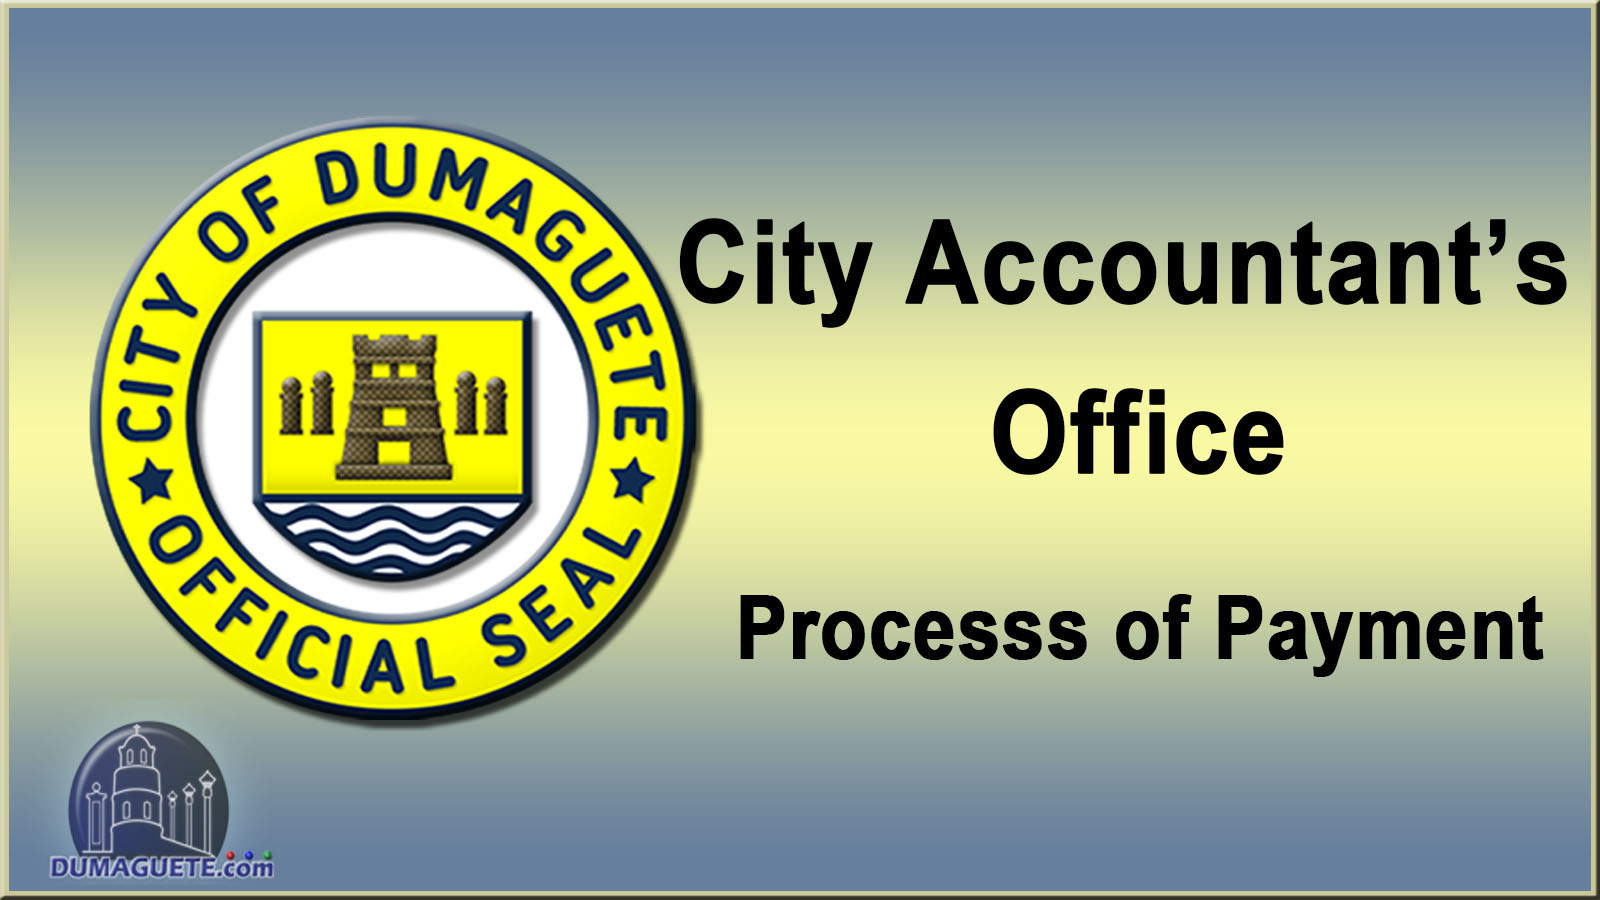 Dumaguete City Accountant's Office